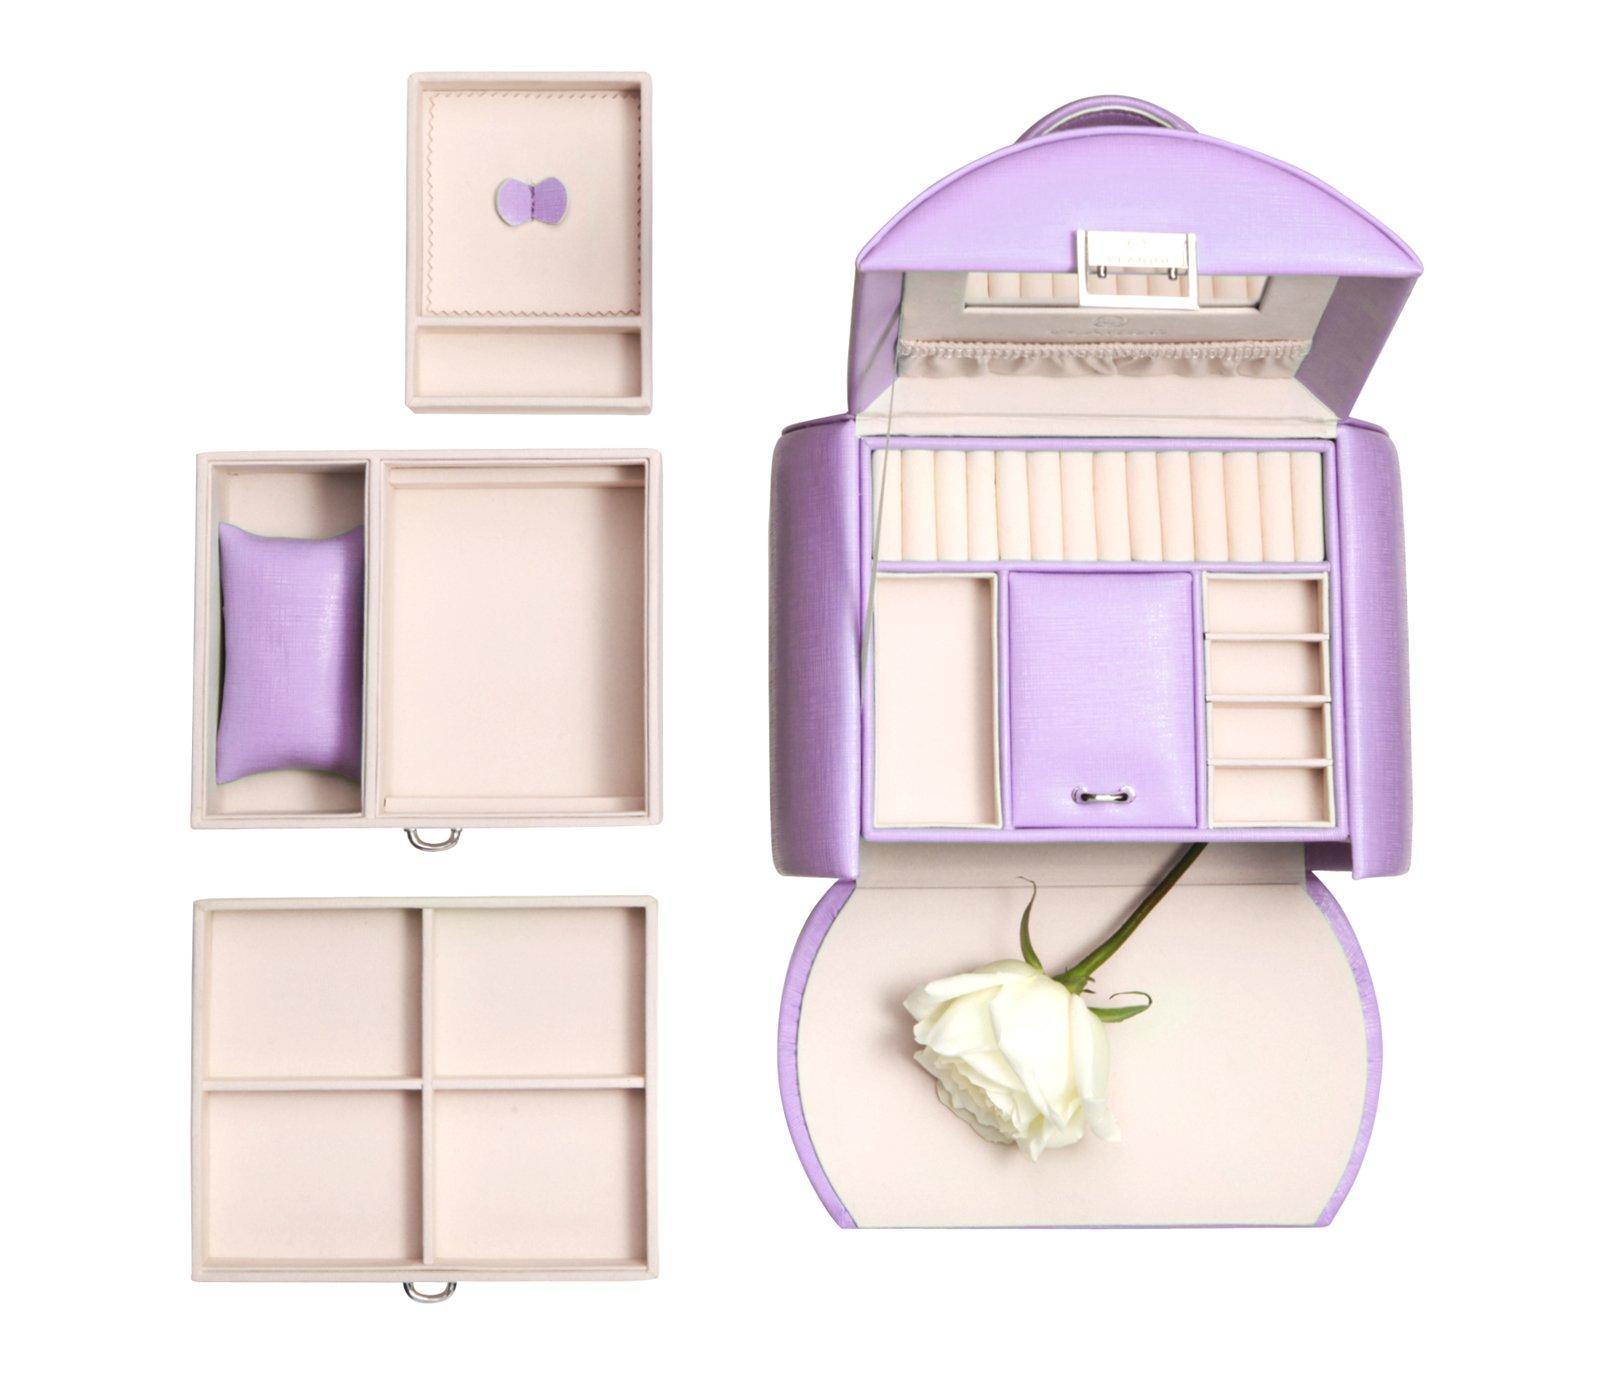 Vlando Princess Style Jewelry Box from Netherlands Design Team, Fabulous Christmas Gift for Girls (Purple) by Vlando (Image #2)